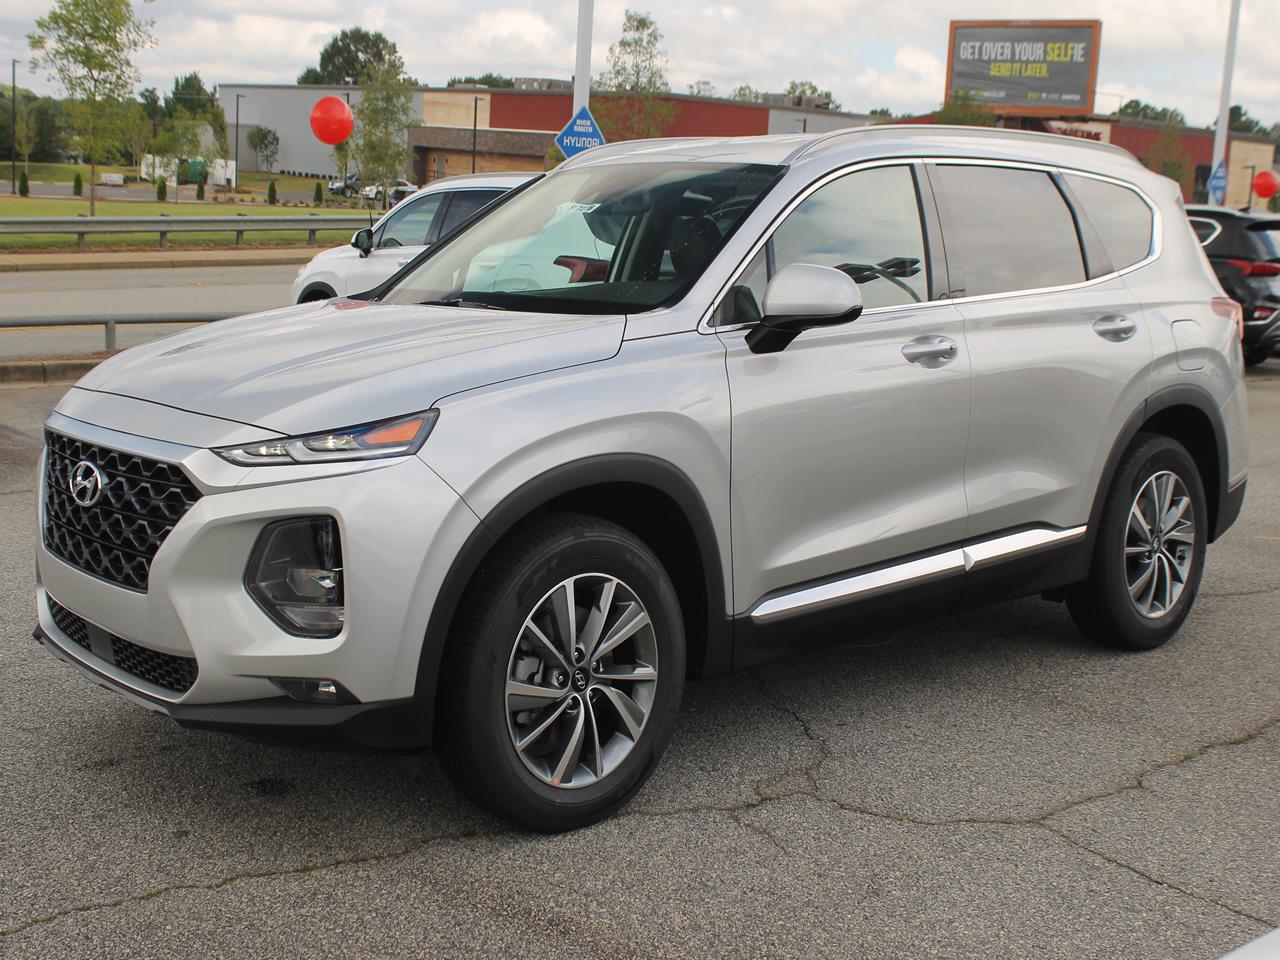 Dick Smith Hyundai >> NEW 2019 HYUNDAI SANTA FE SEL PLUS 2.4 VIN 5NMS33AD9KH031673 - Hyundai in Greenville | Hyundai ...